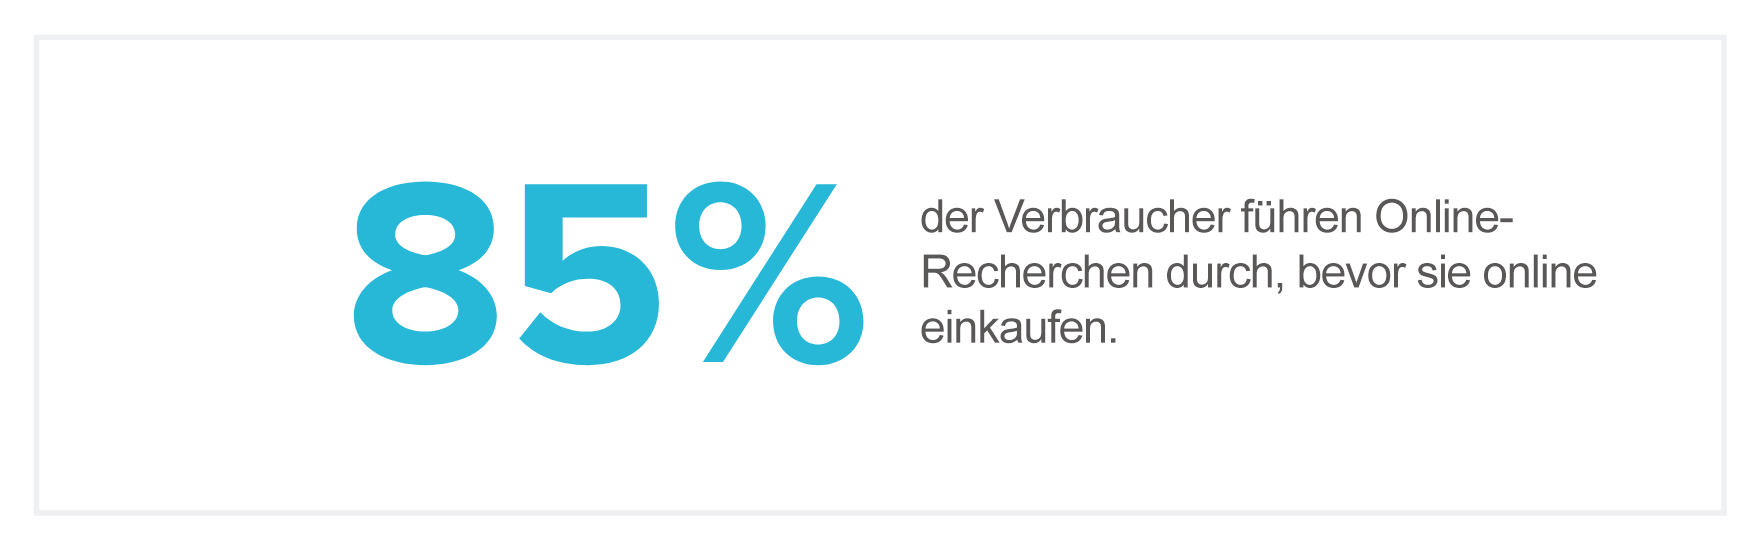 E-Commerce Statistik - Online recherche